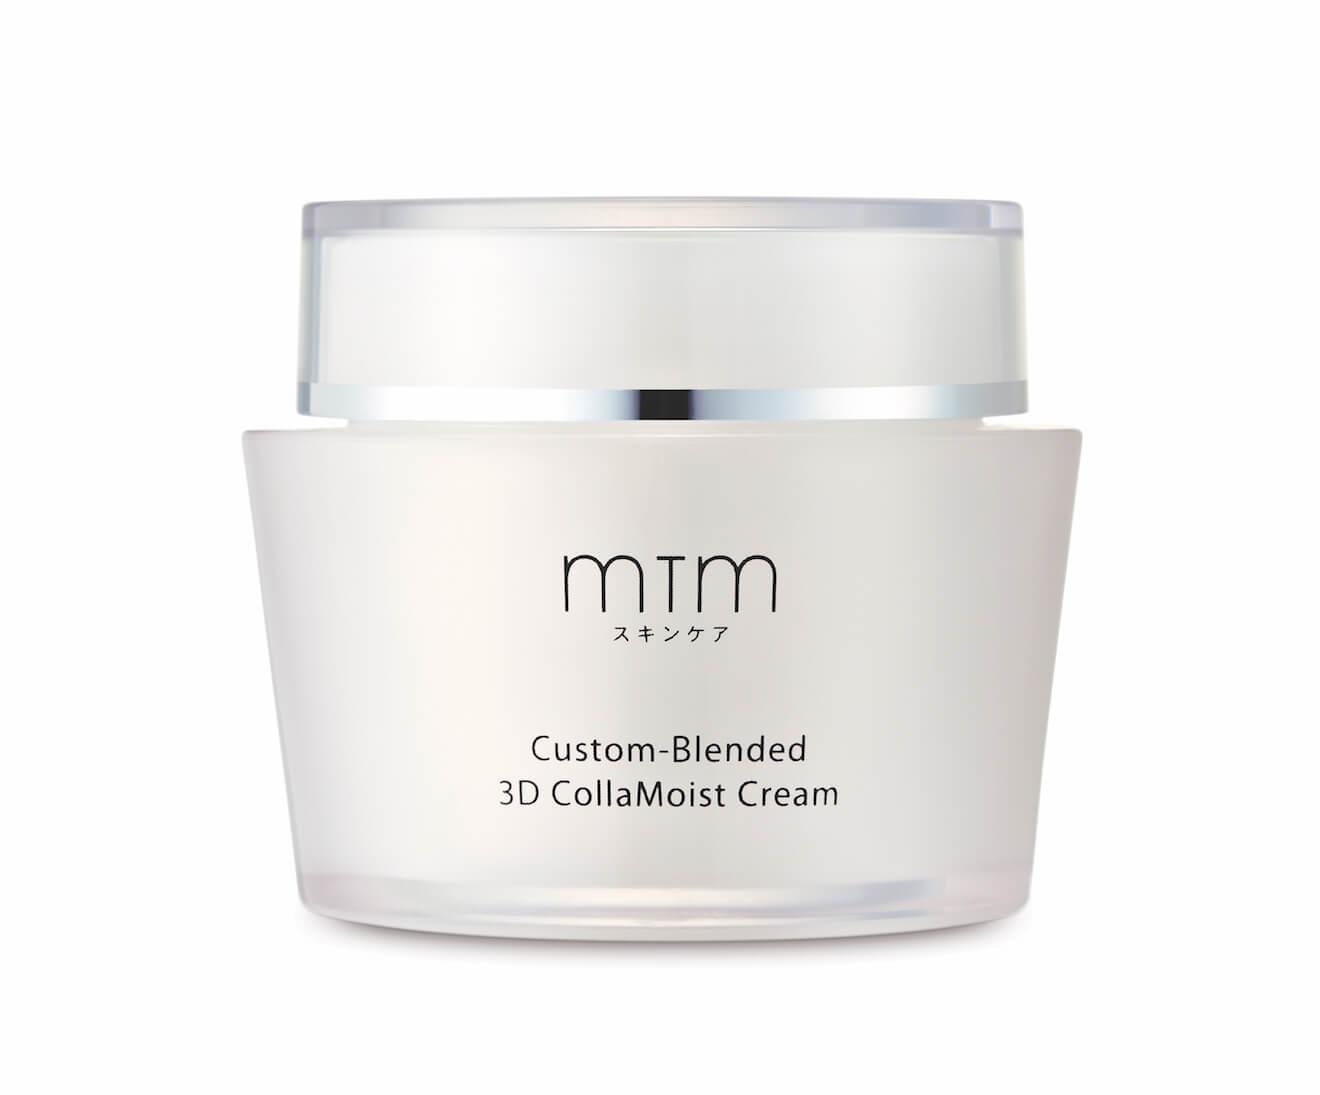 - MTM CB 3D CollaMoist Cream - 啟動3D肌密!MTM Custom-Blended 3D CollaMoist系列